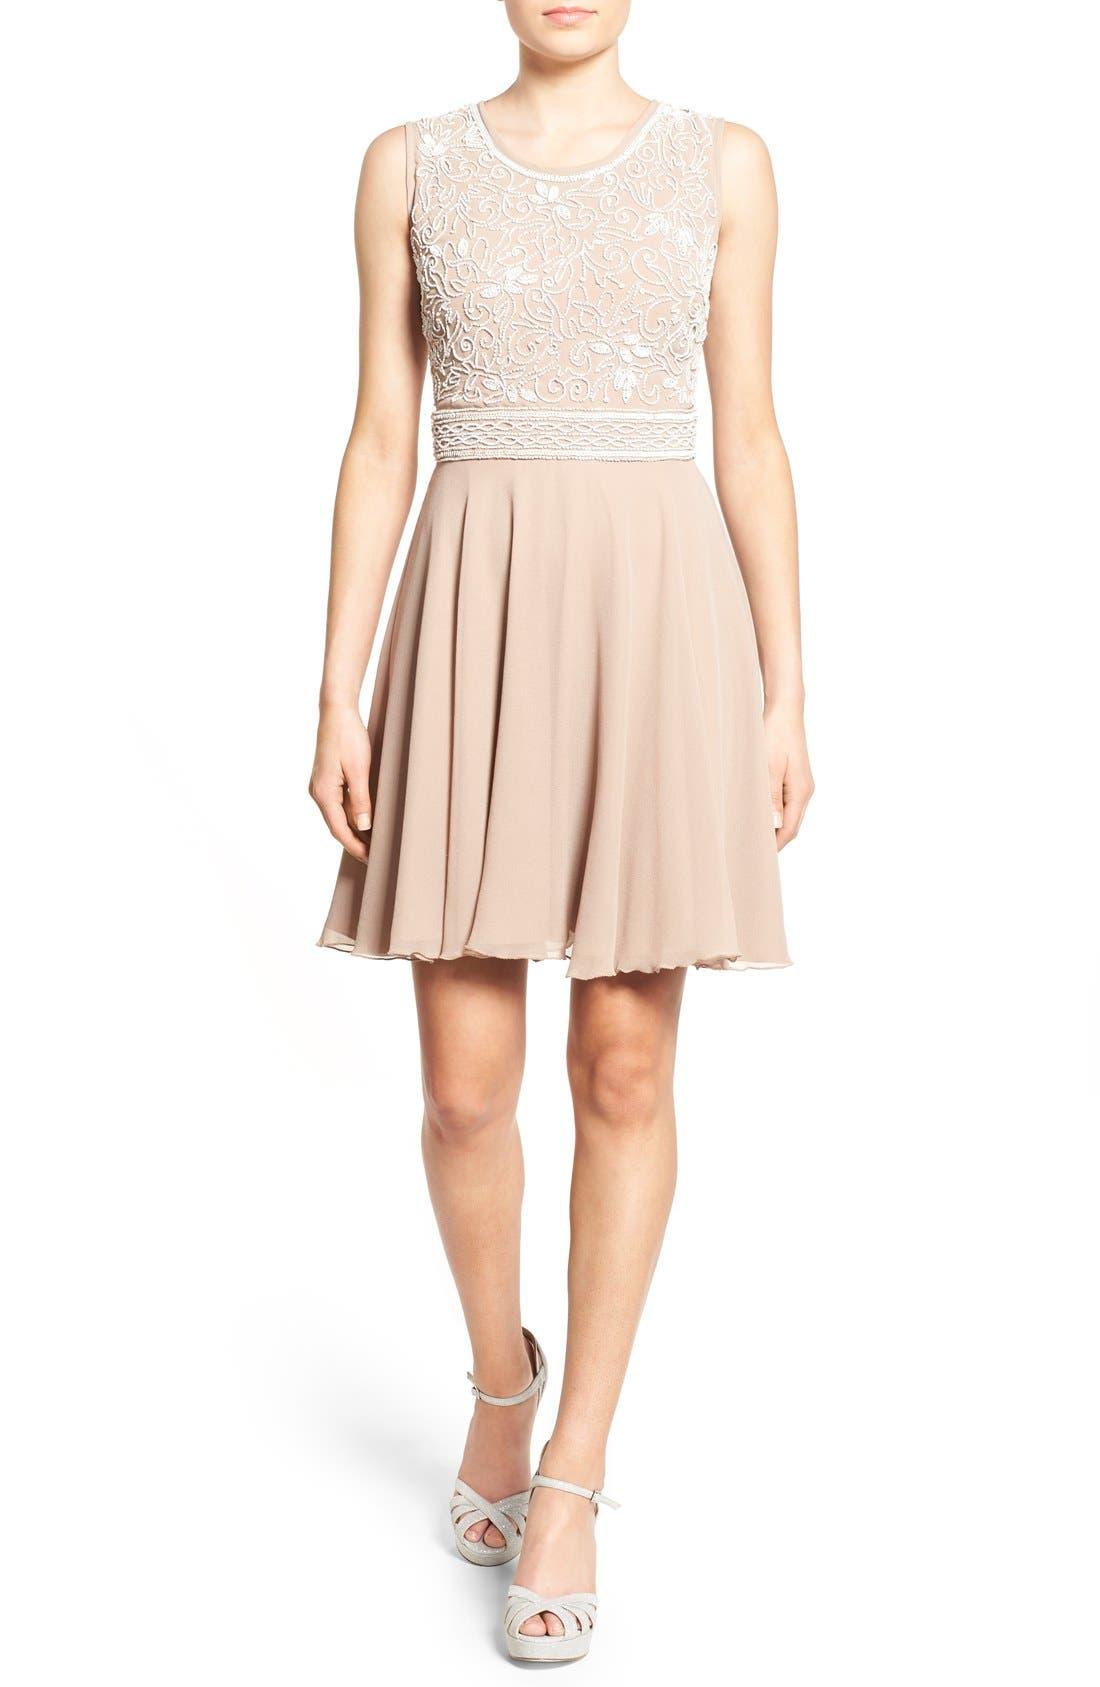 Alternate Image 1 Selected - Lace & Beads 'Lola' Embellished Skater Dress